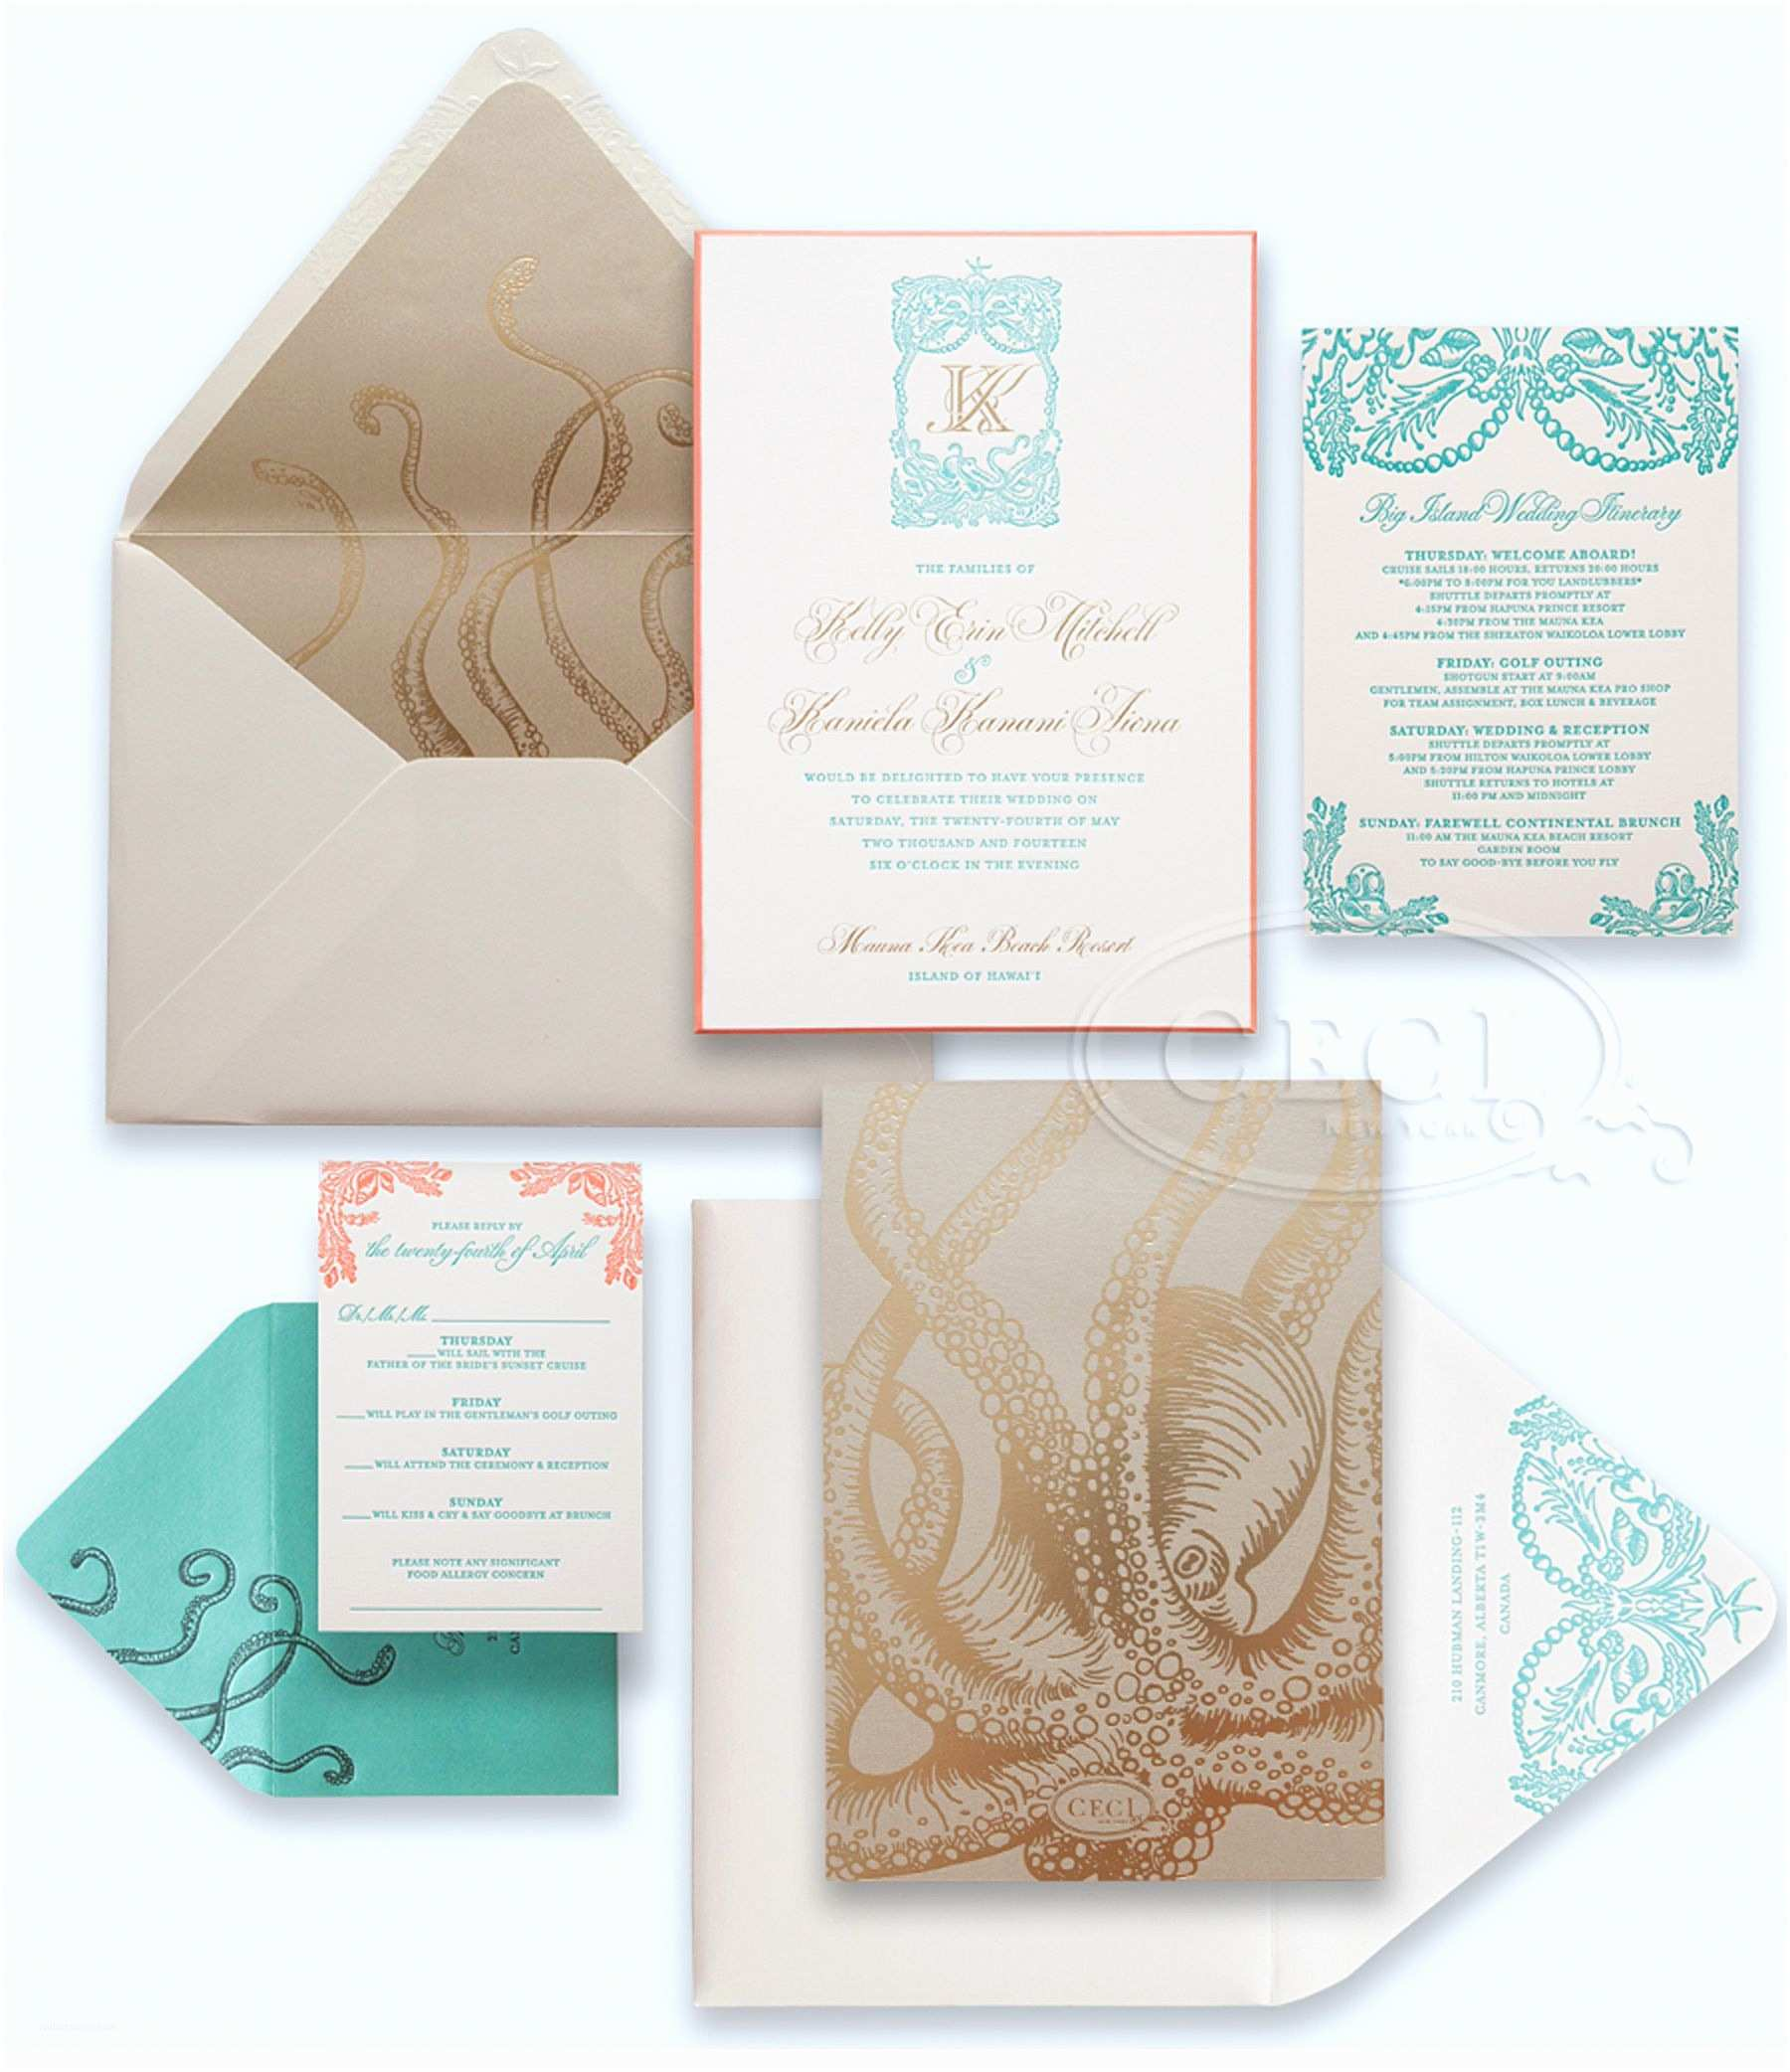 Hawaii Wedding Invitations Luxury Wedding Invitations By Ceci New York Our